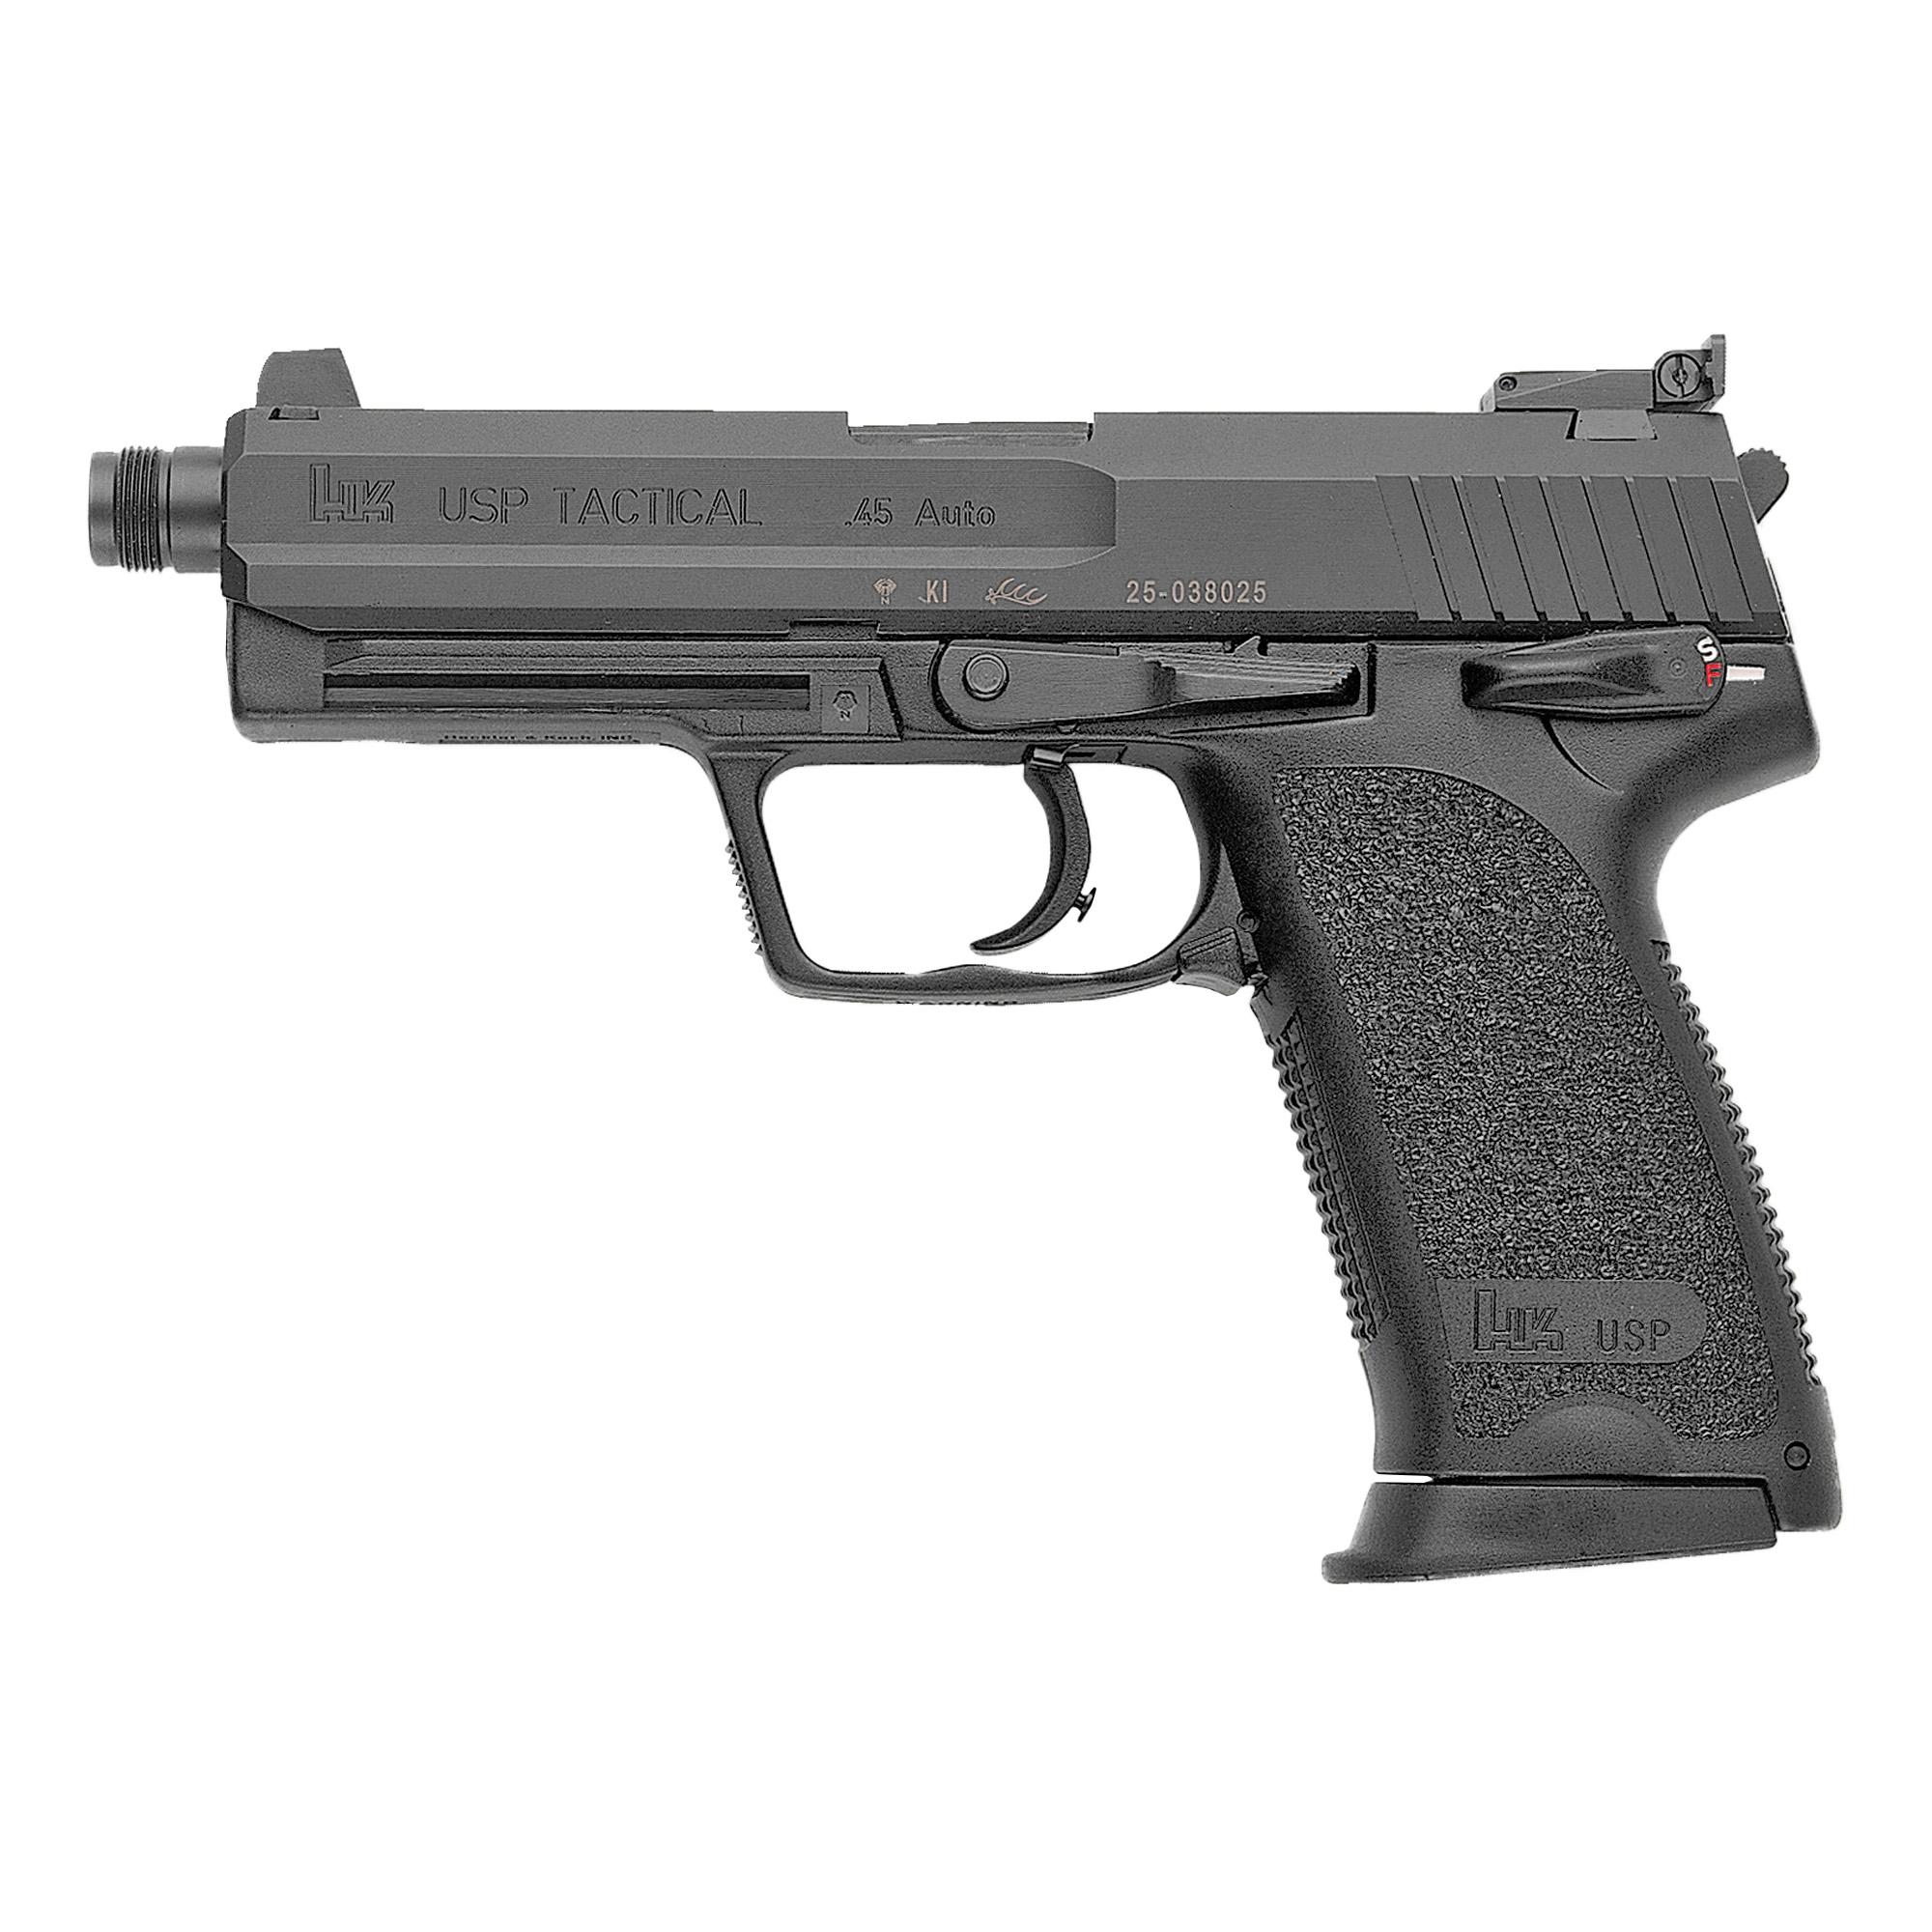 Heckler & Koch USP Tactical, 45ACP